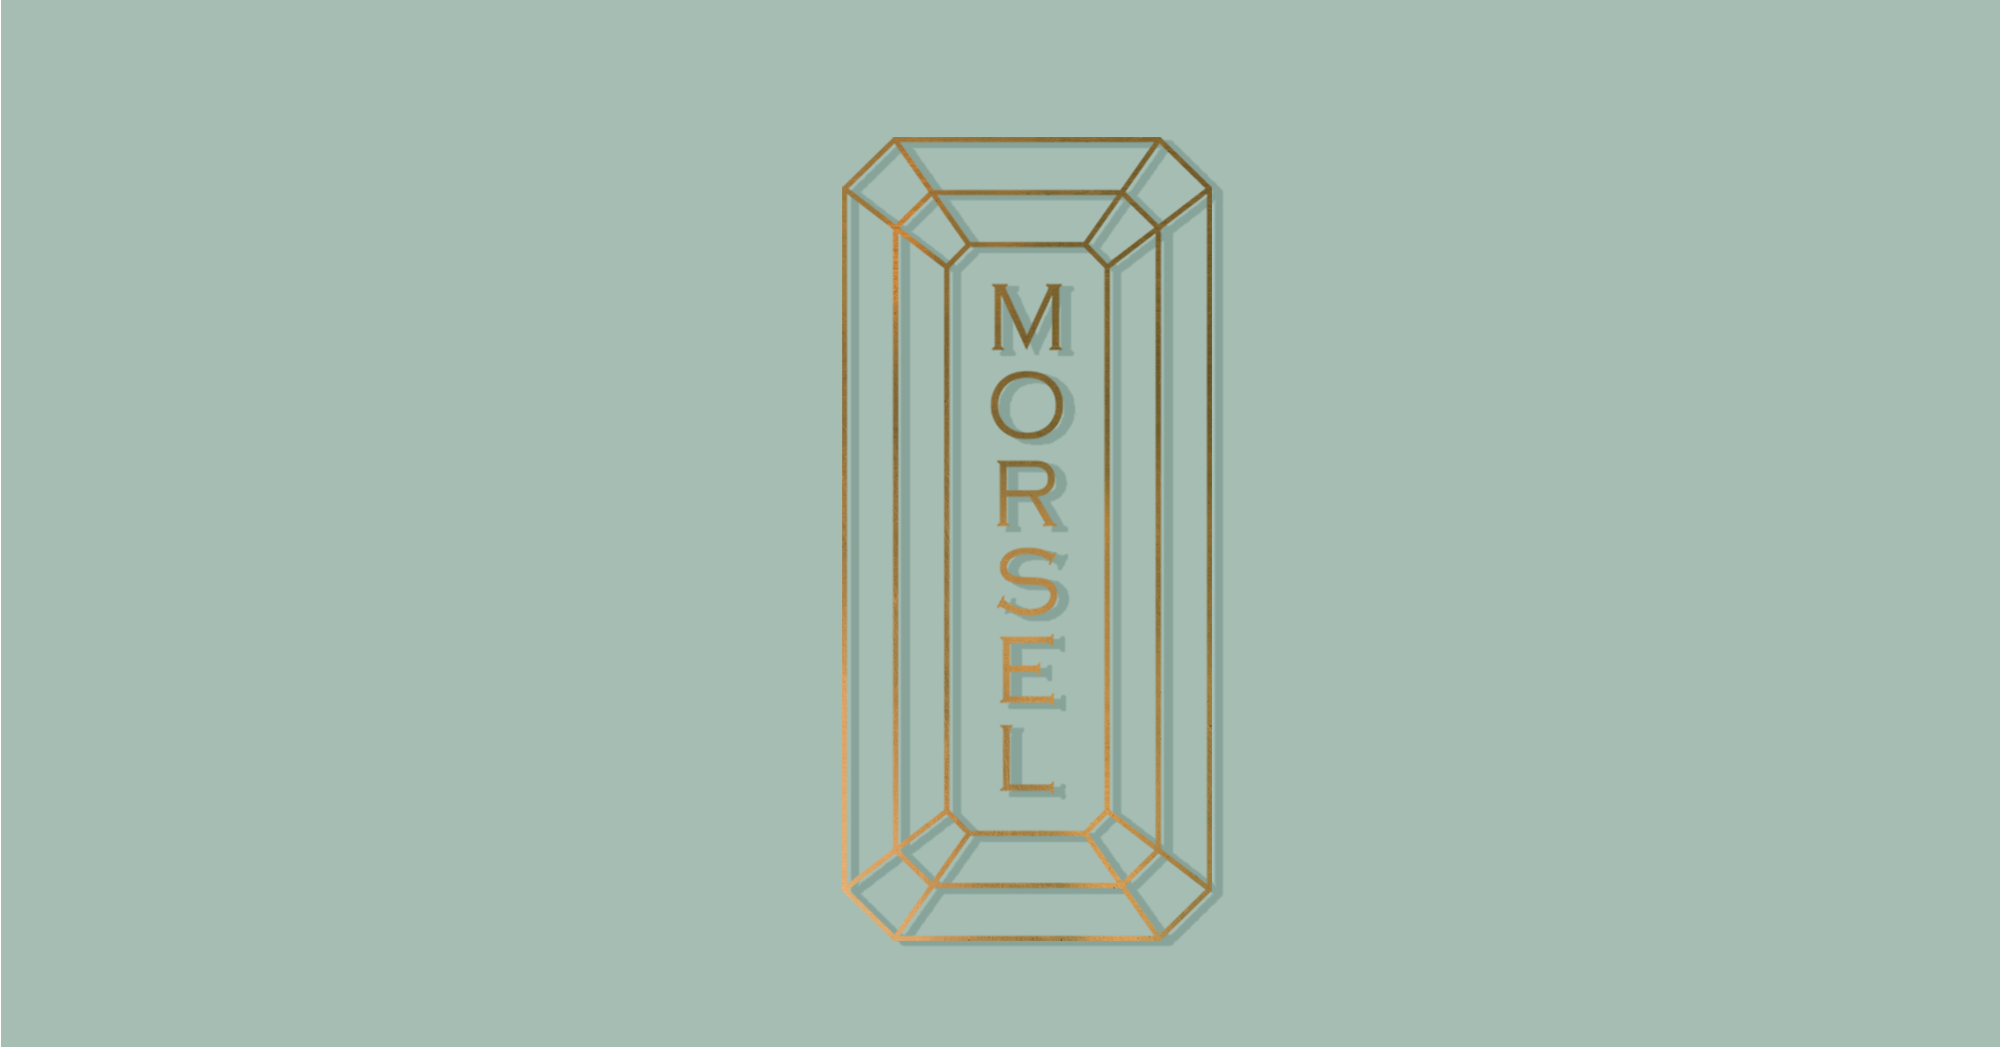 updated image of logo morsel